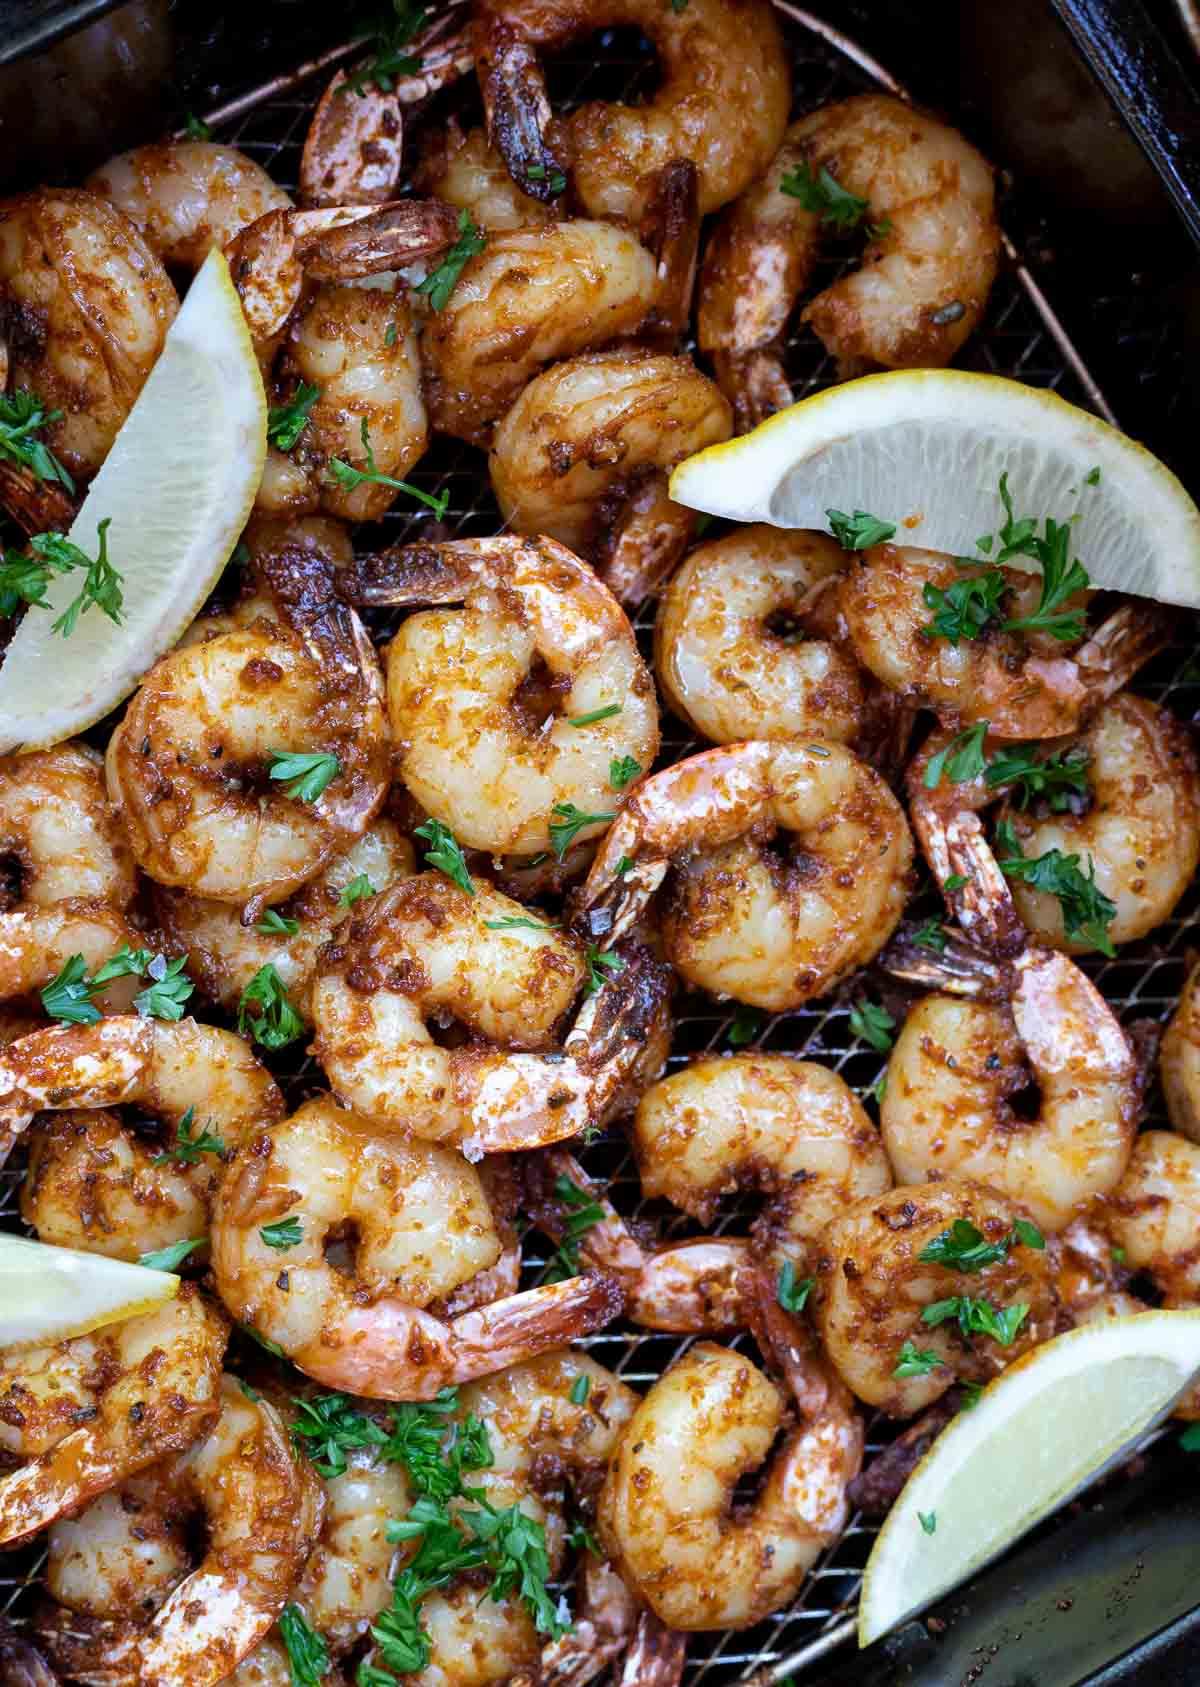 blackened shrimp and lemons in air fryer basket